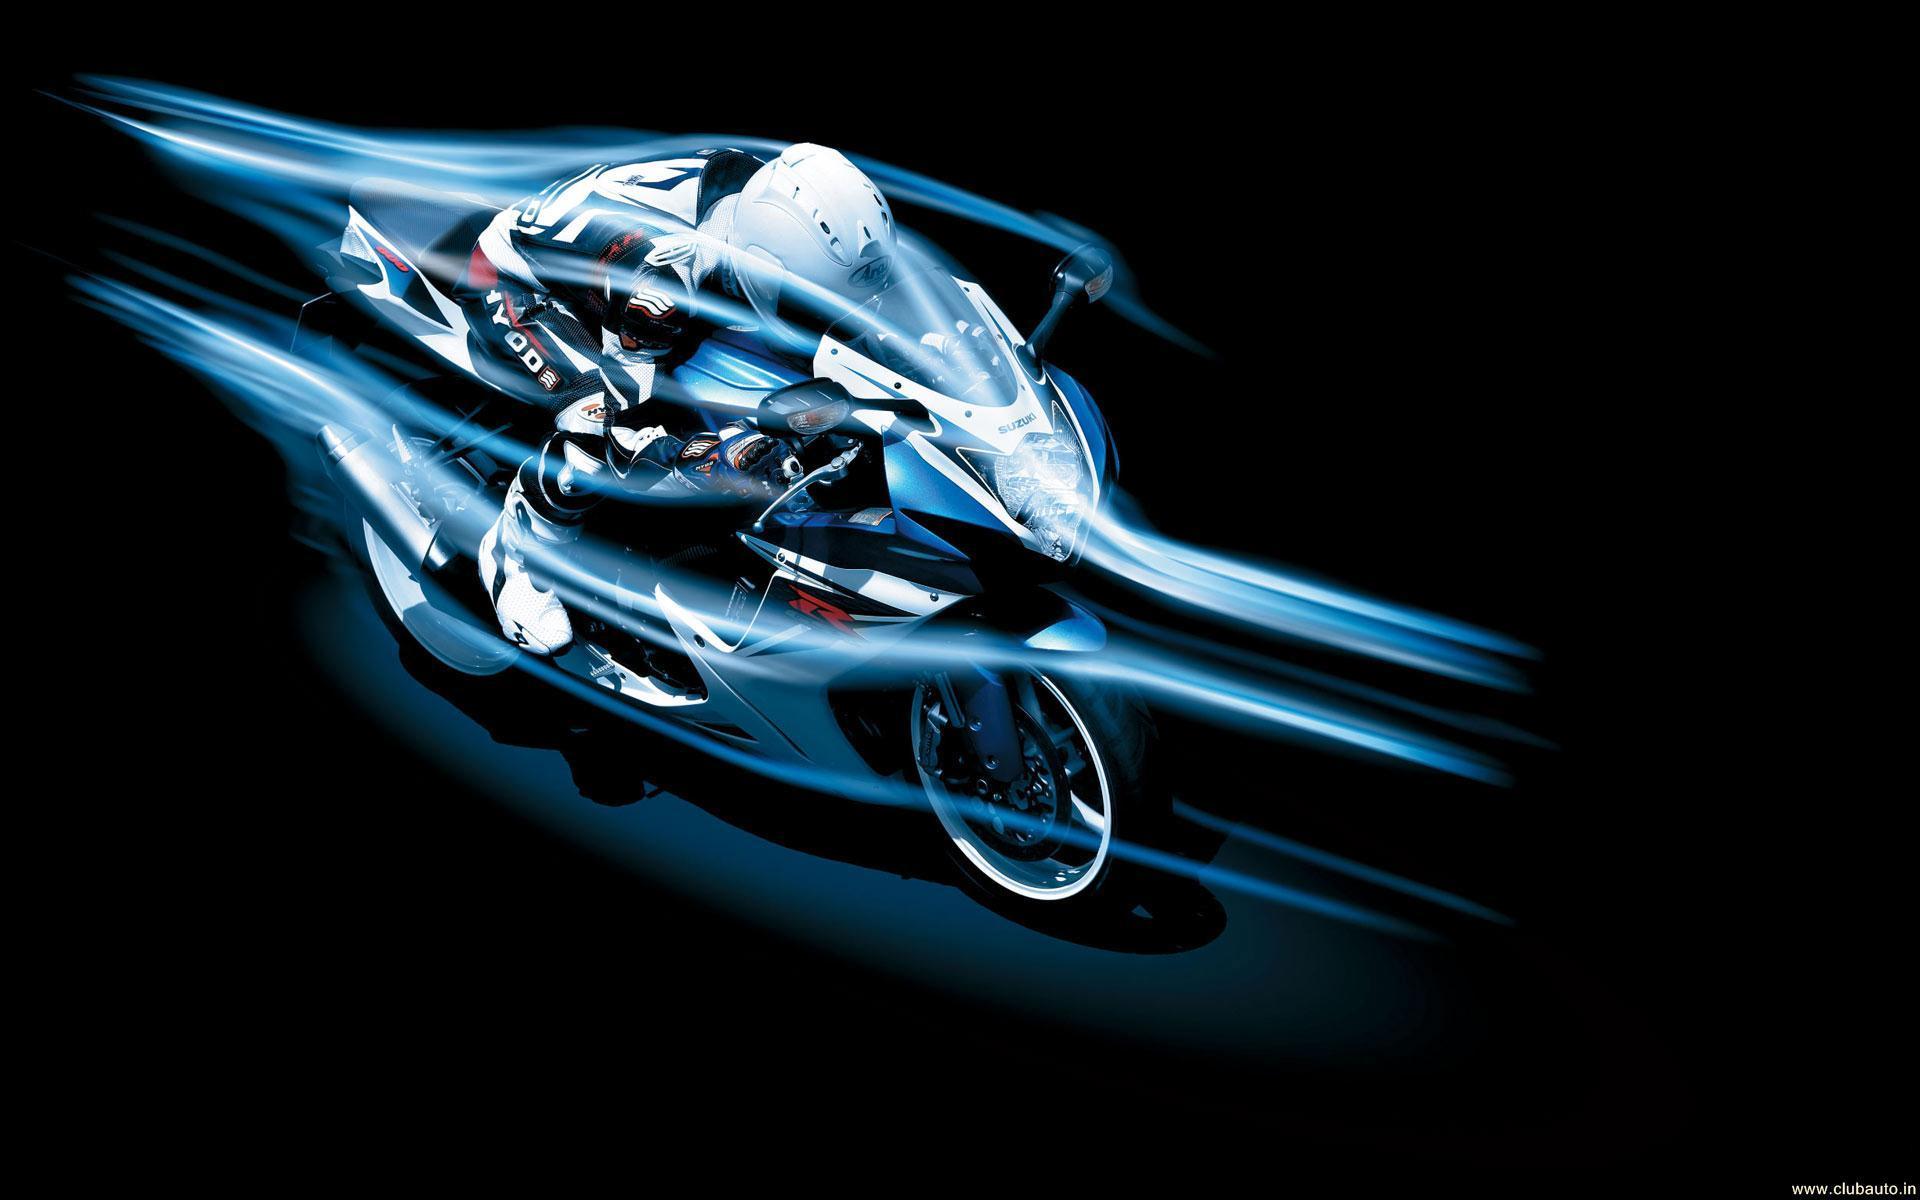 Suzuki Bikes Wallpapers - Full HD wallpaper search - page 3